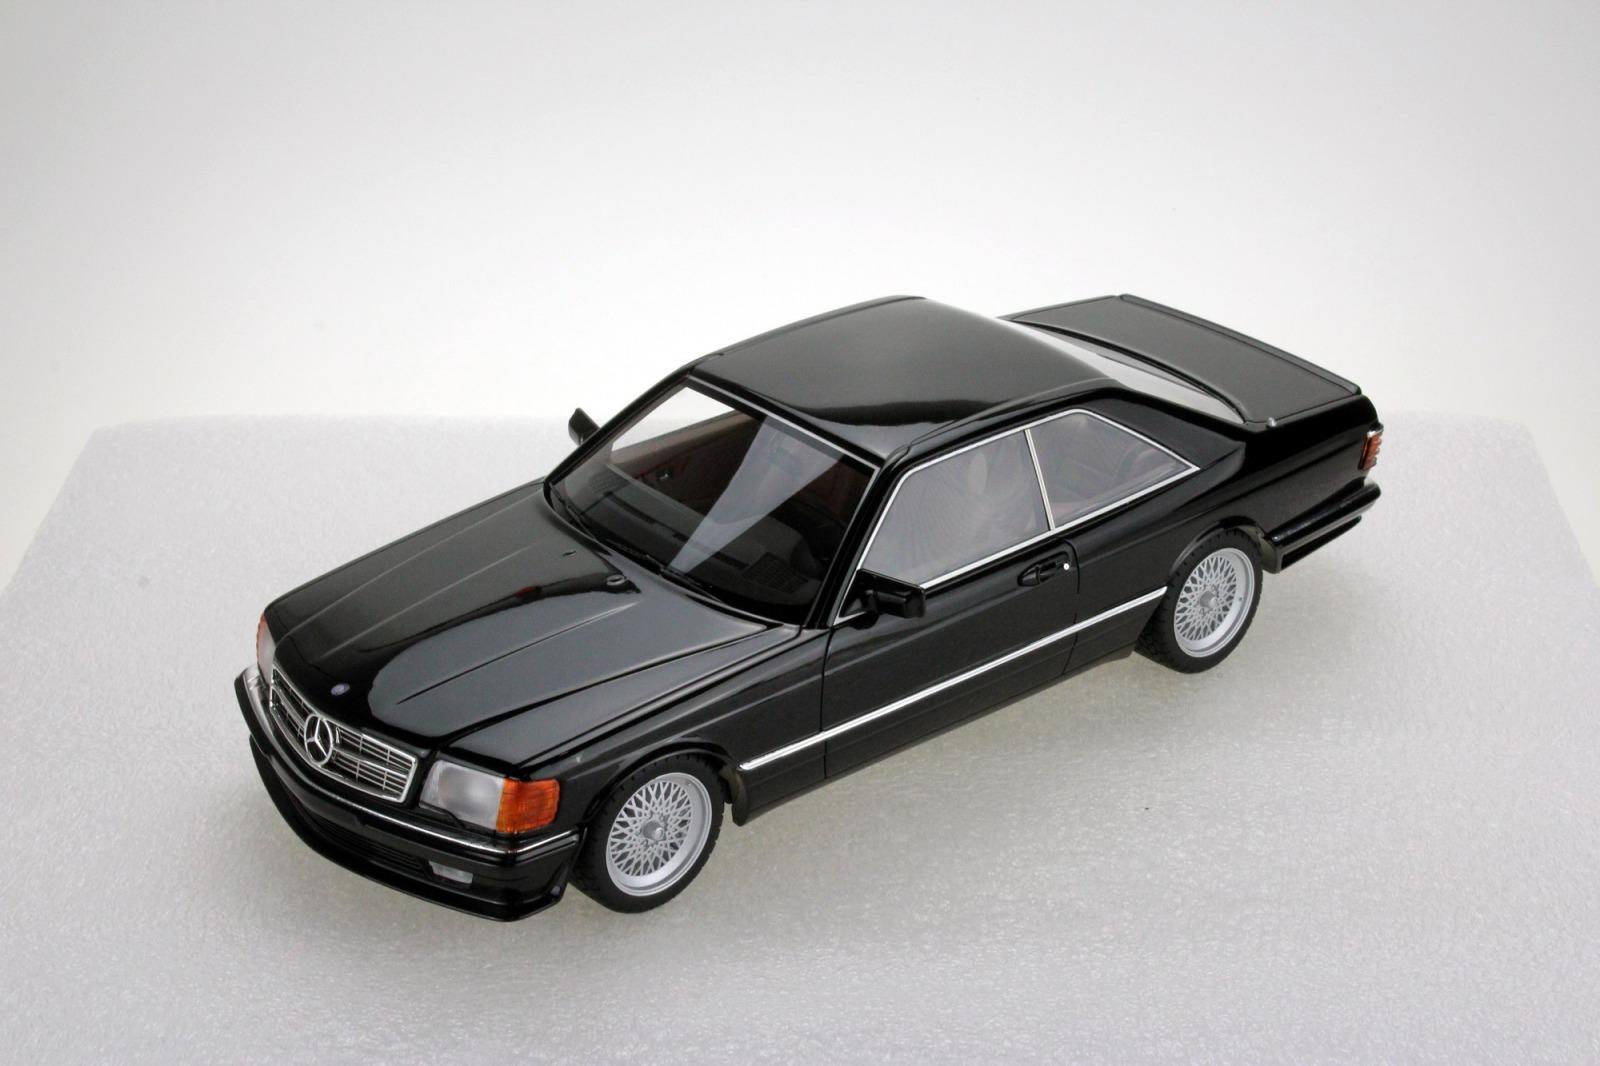 LS Collectibles 1/18 ミニカー レジン・プロポーションモデル 1987年モデル メルセデスベンツ S Class 560SEC 6.0 Lorinser MERCEDES BENZ - S-CLASS 560SEC 6.0 Lorinser (C126) COUPE 1987 1:18 LS Collectibles